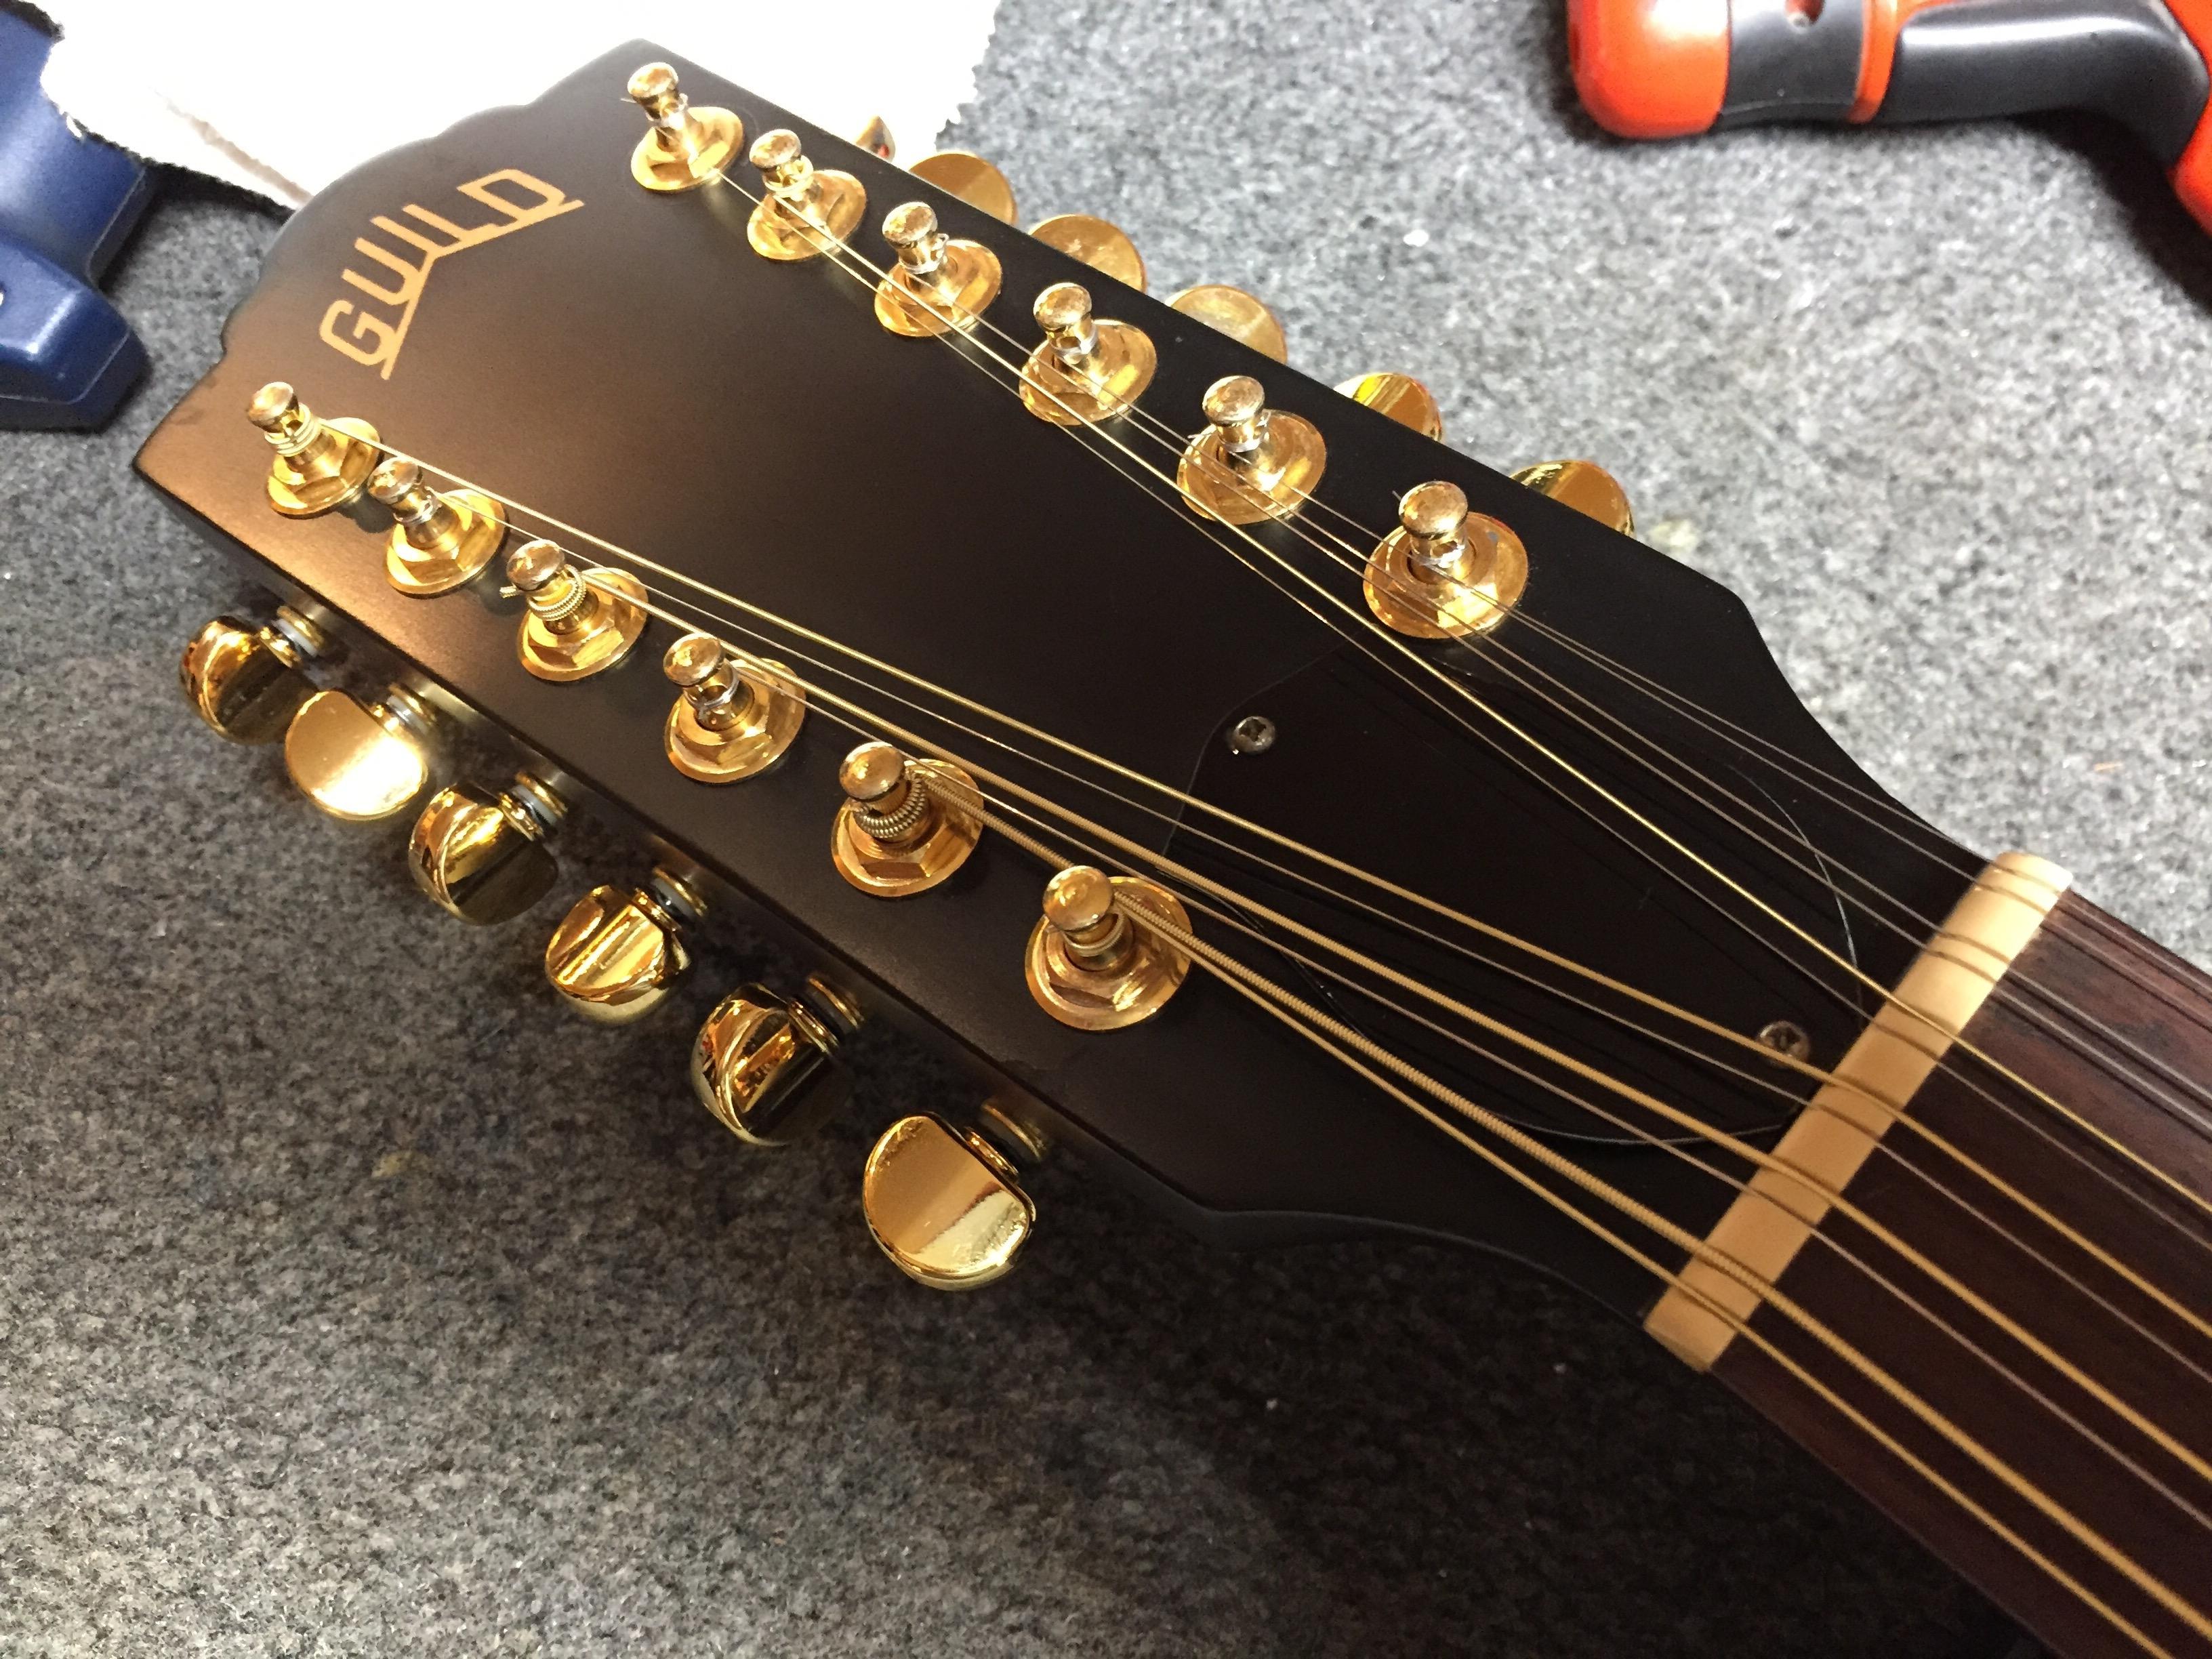 guild 12 string in for a lr baggs anthem acoustic pickup install guitars united. Black Bedroom Furniture Sets. Home Design Ideas